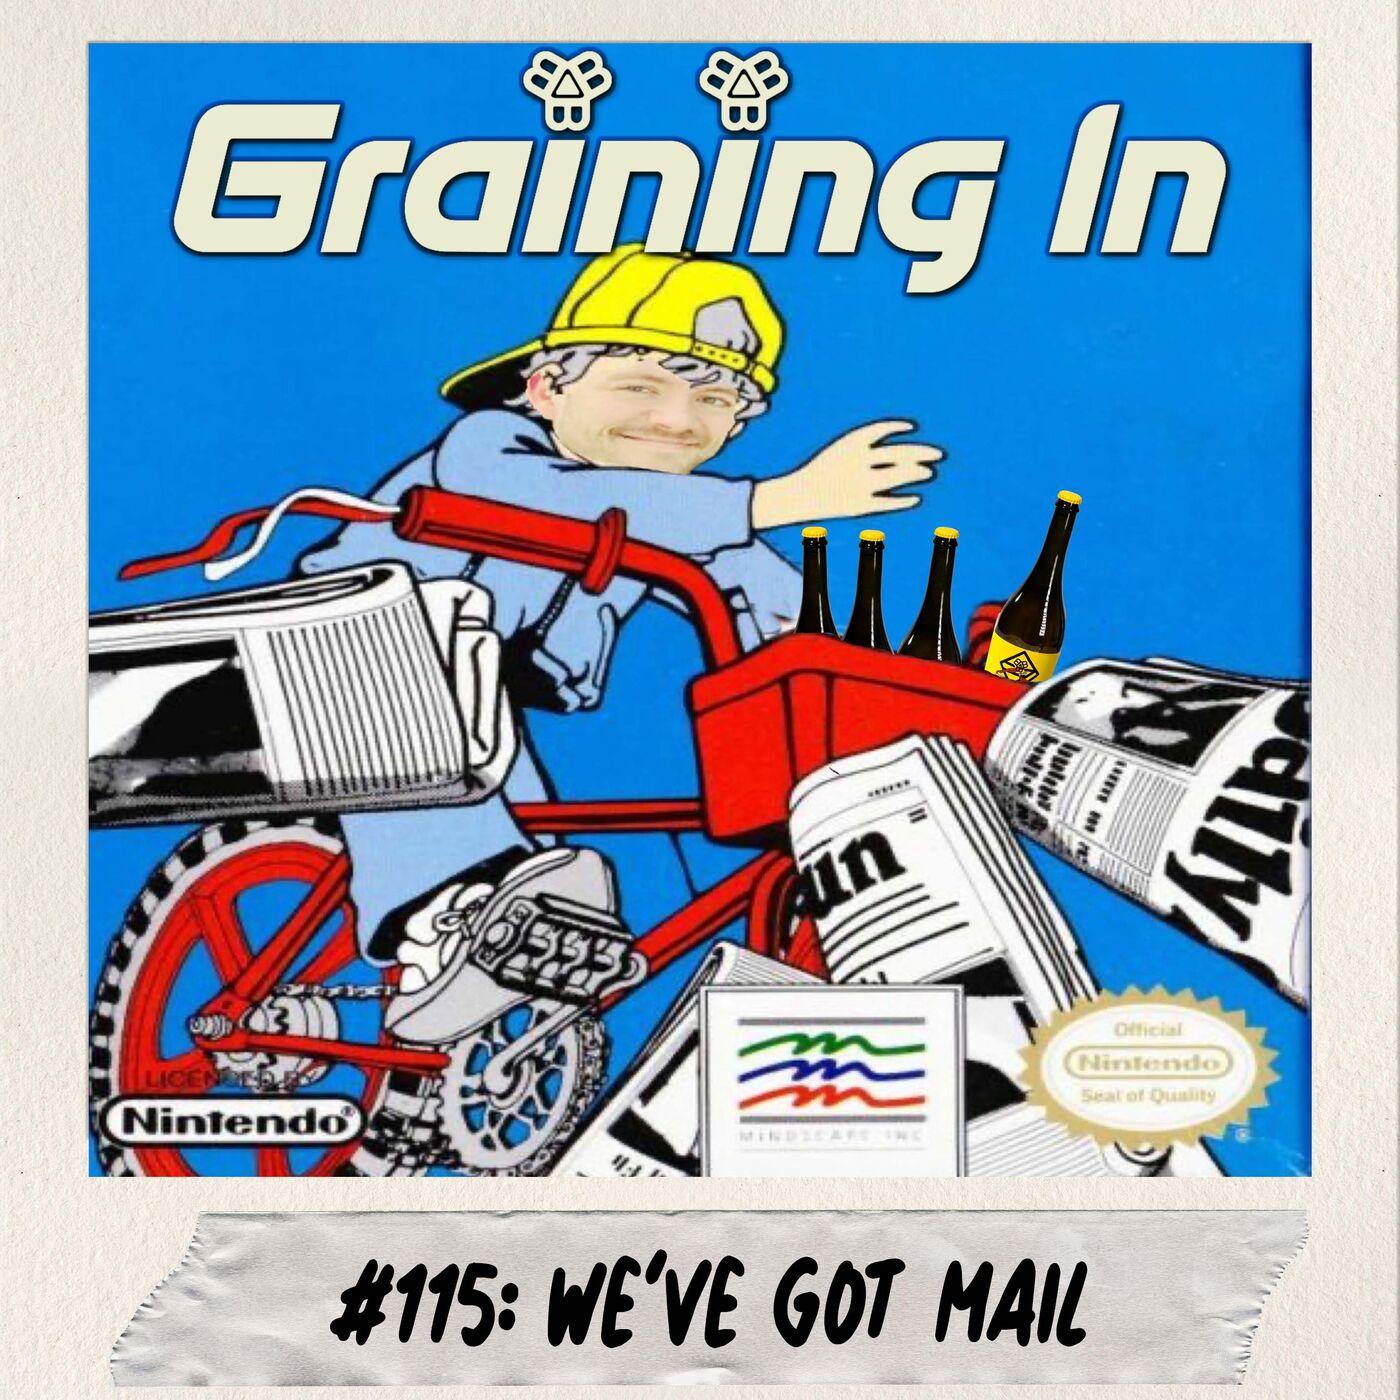 #115: We've Got Mail